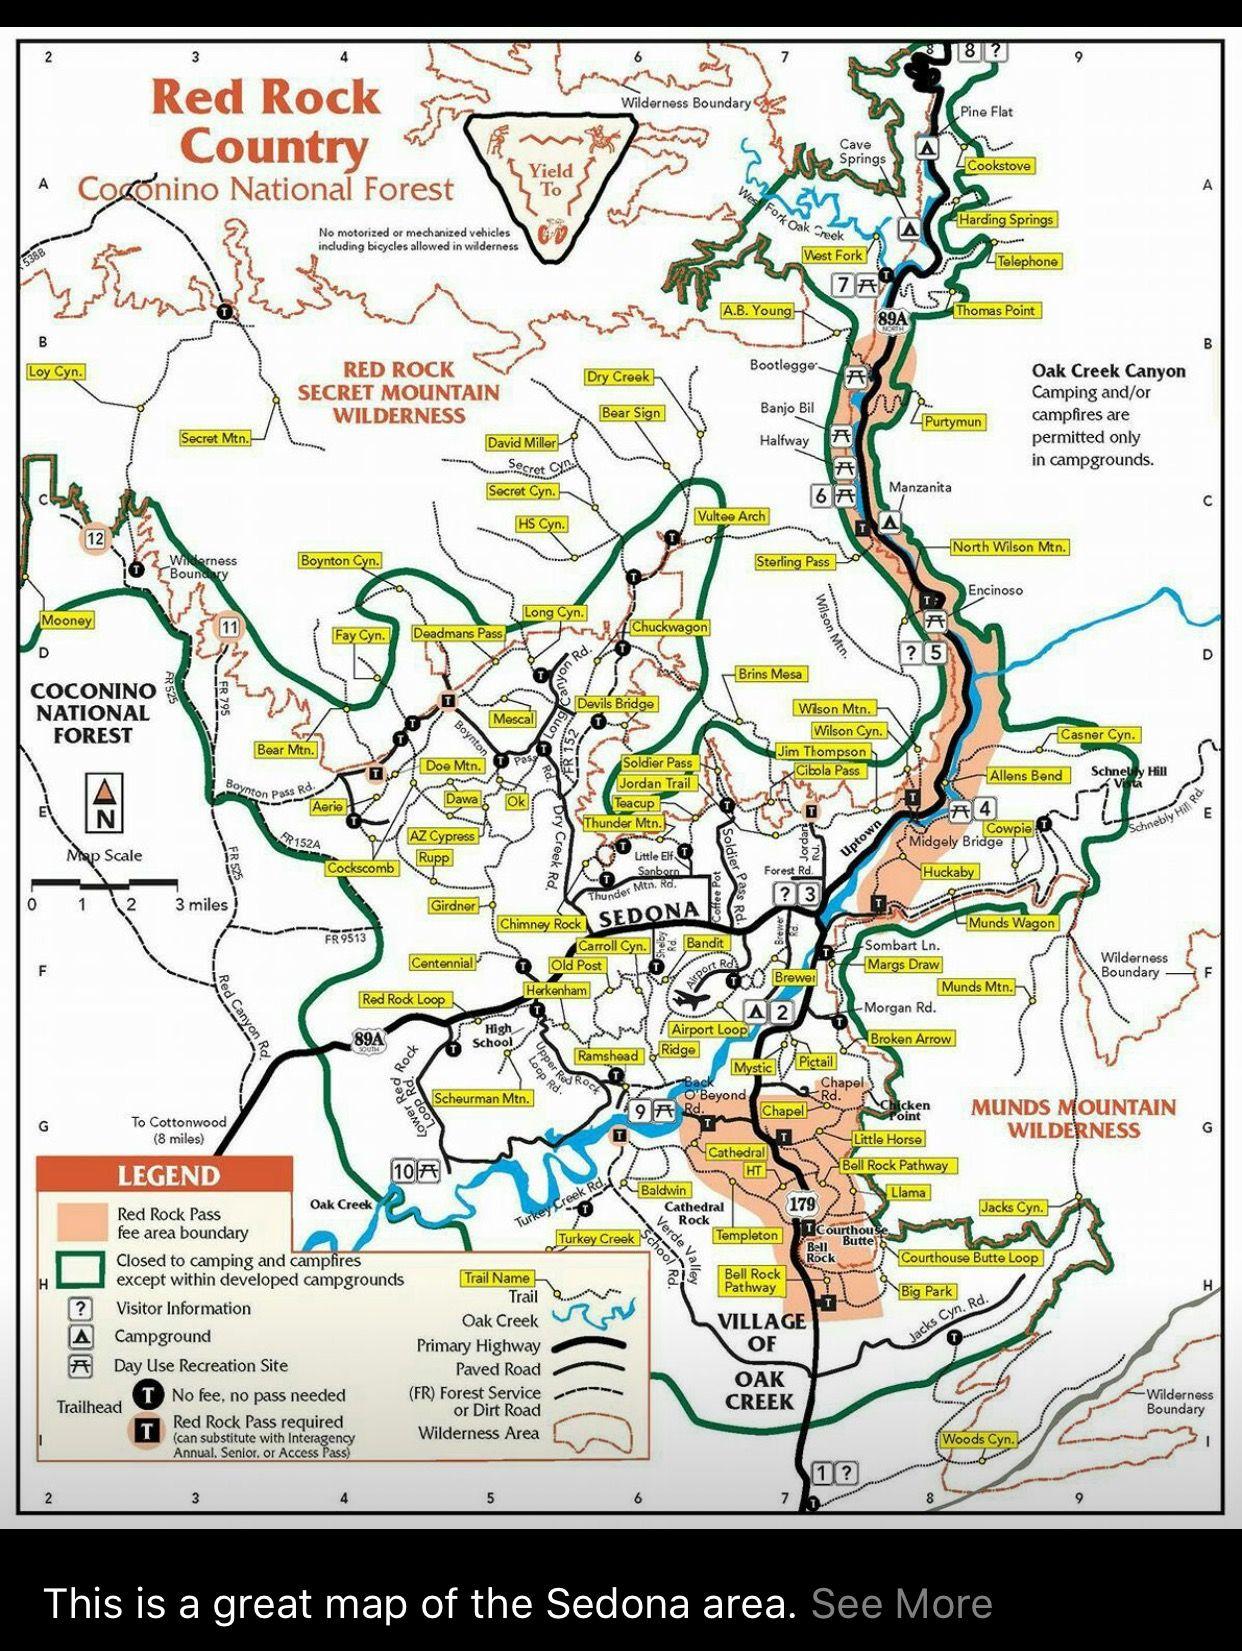 Sedona trail/campsite map | AZ Road Trips in 2019 | Arizona travel ...